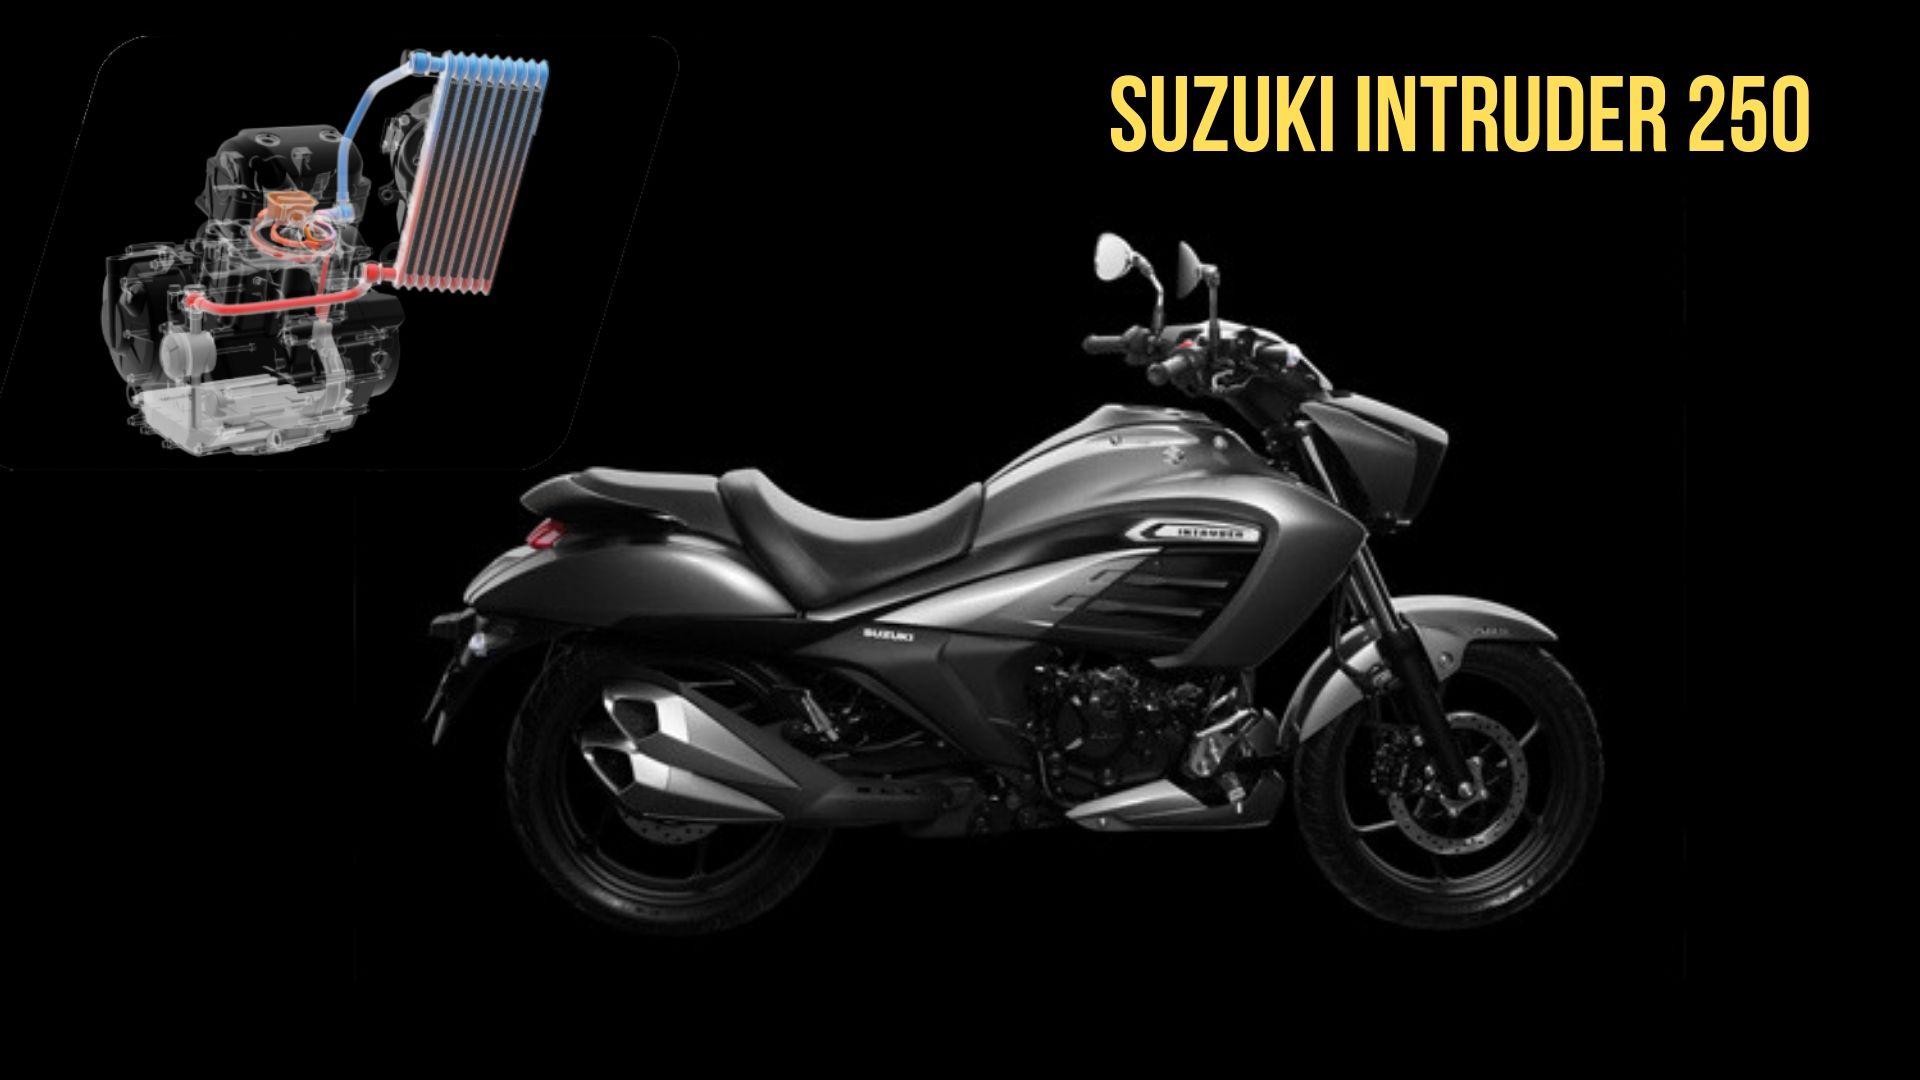 All-New Suzuki Intruder 250 India Launch Likely Next Year